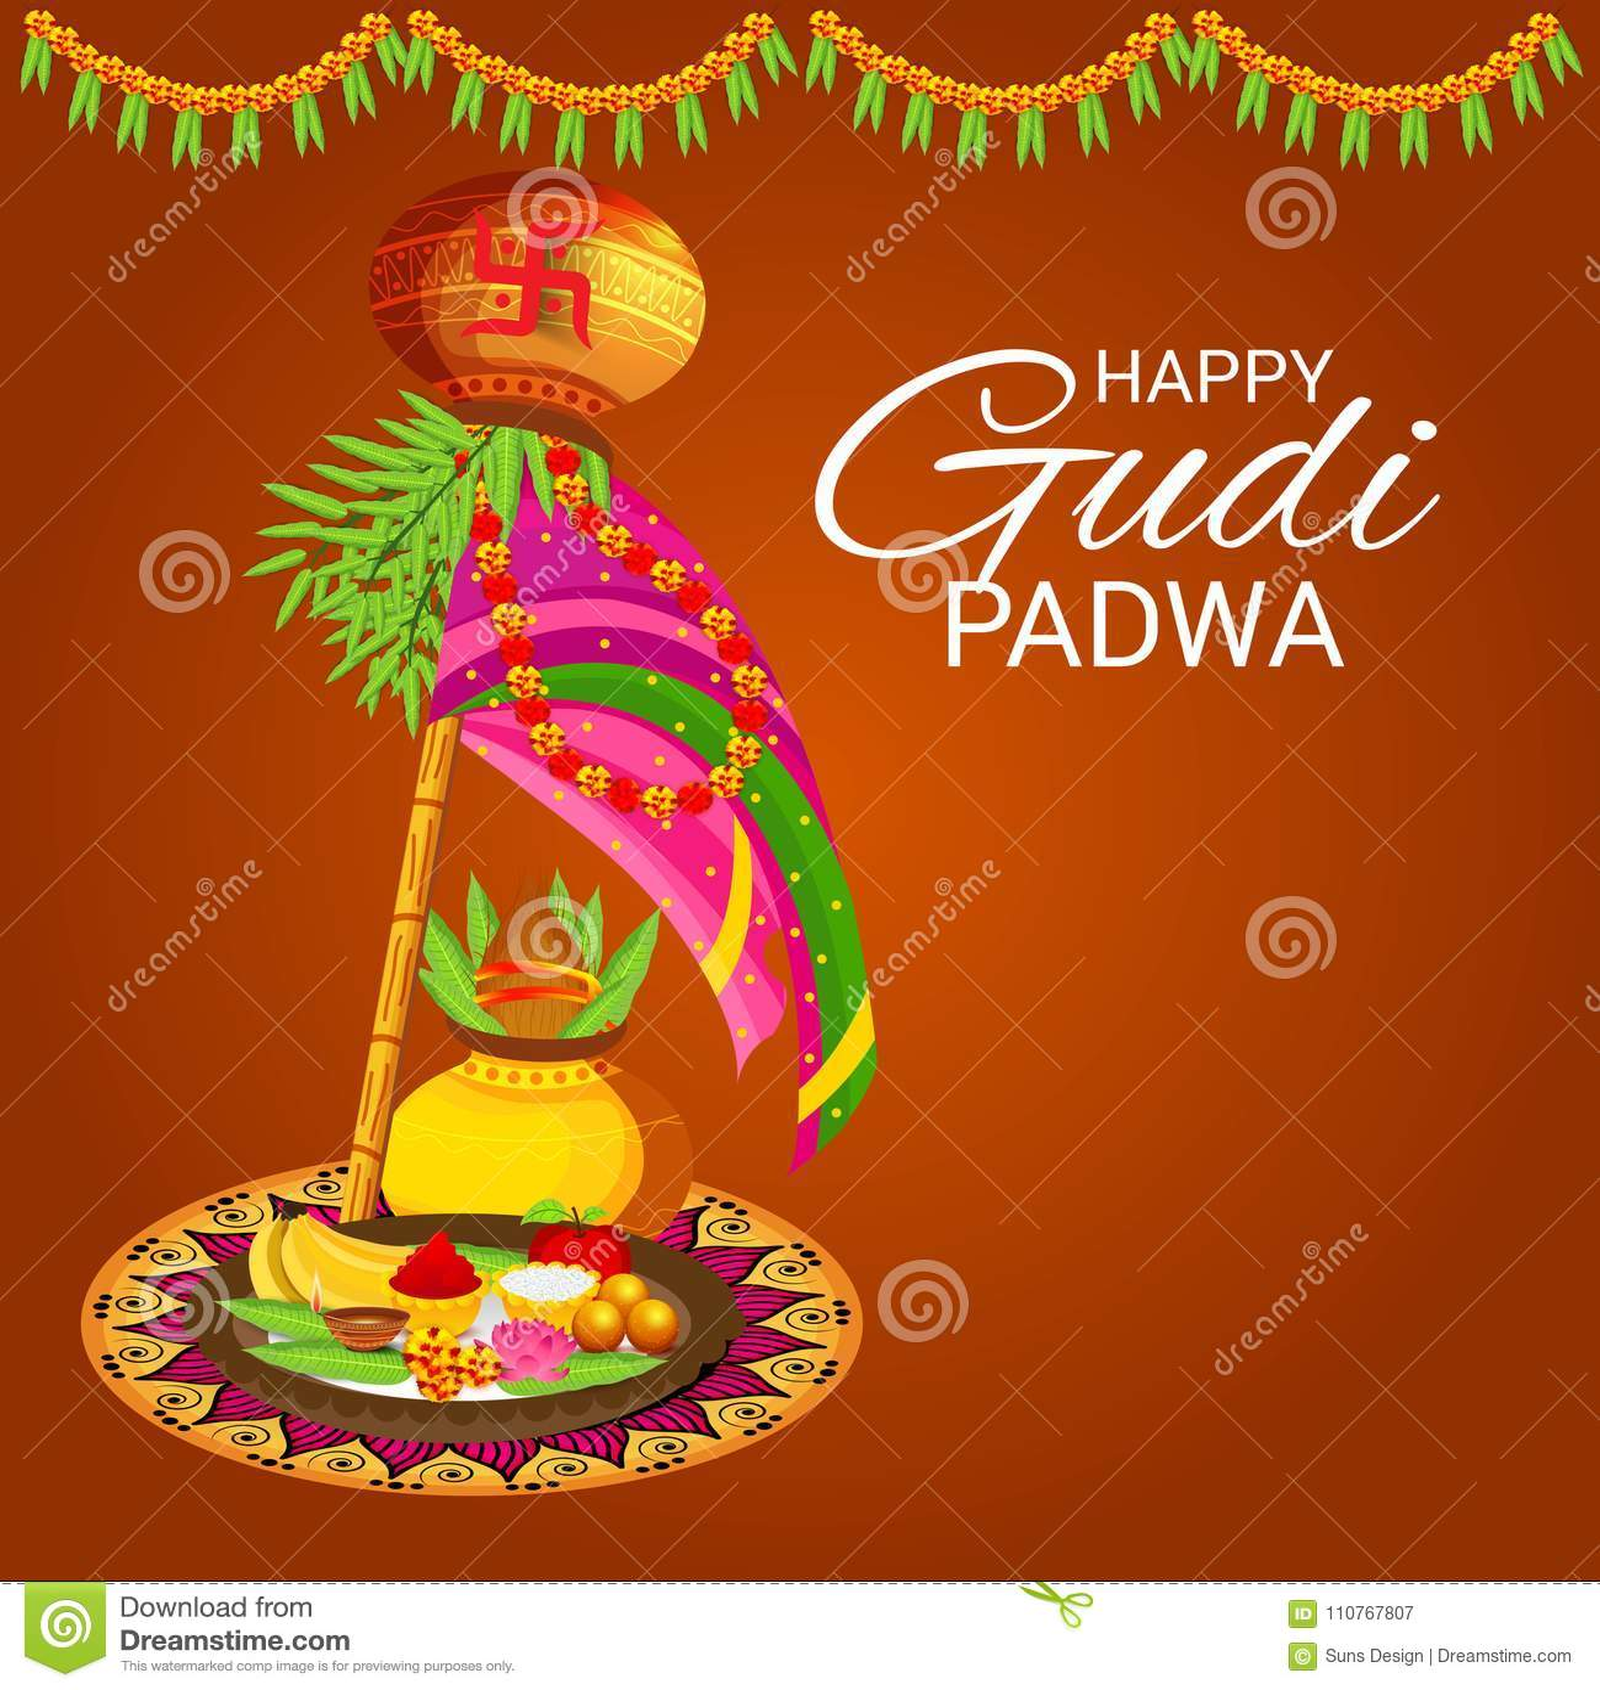 Happy gudi padwa marathi new year stock illustration illustration happy gudi padwa marathi new year culture card kristyandbryce Gallery